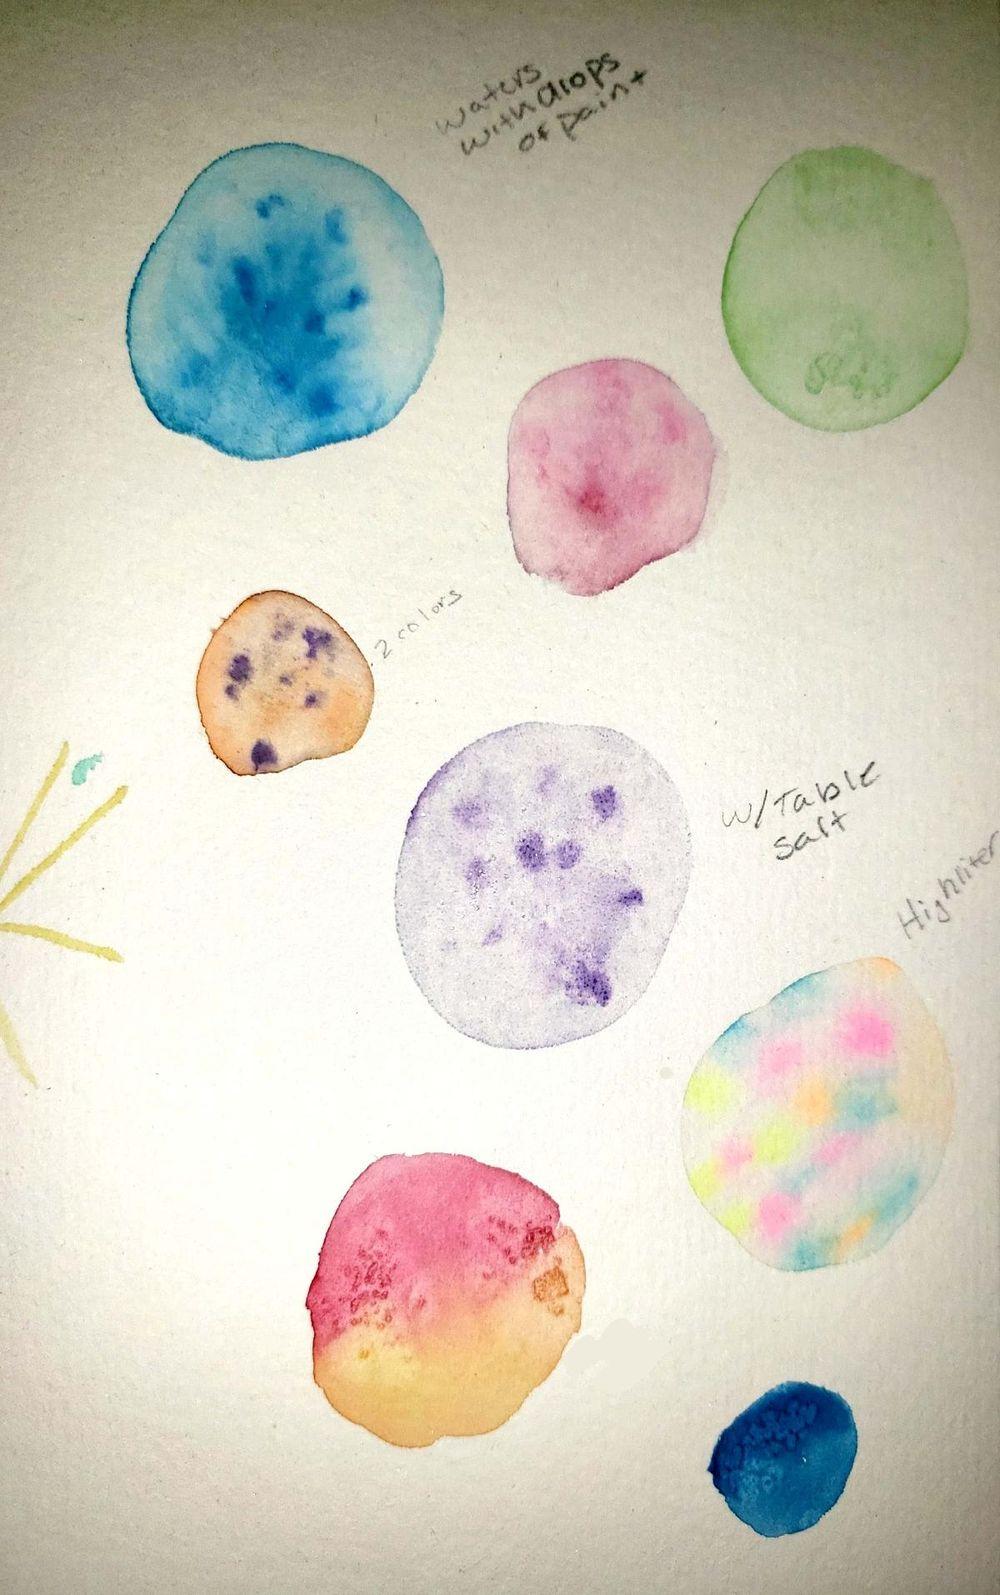 Wonderful Watercolors! - image 6 - student project